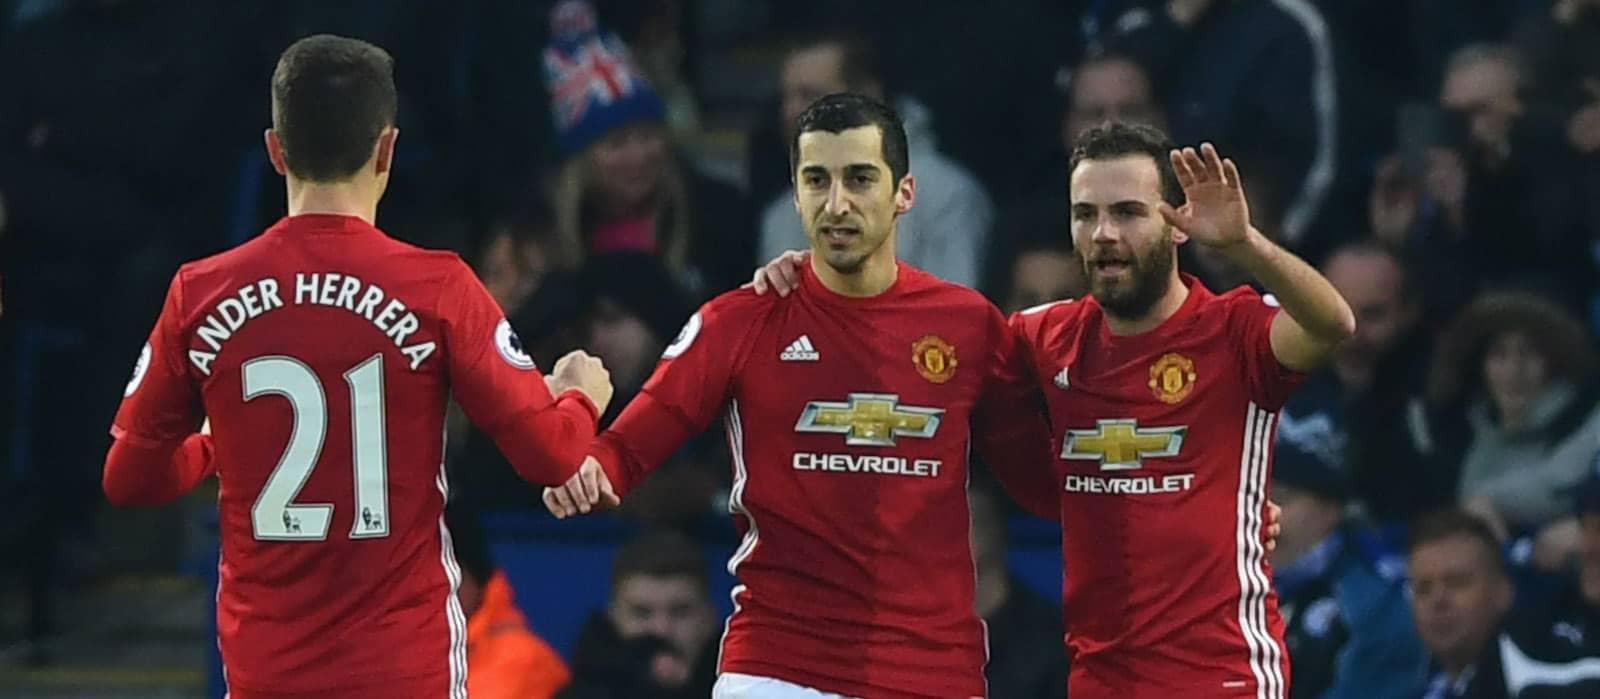 Henrikh Mkhitaryan wins goal of the season with Sunderland scorpion kick